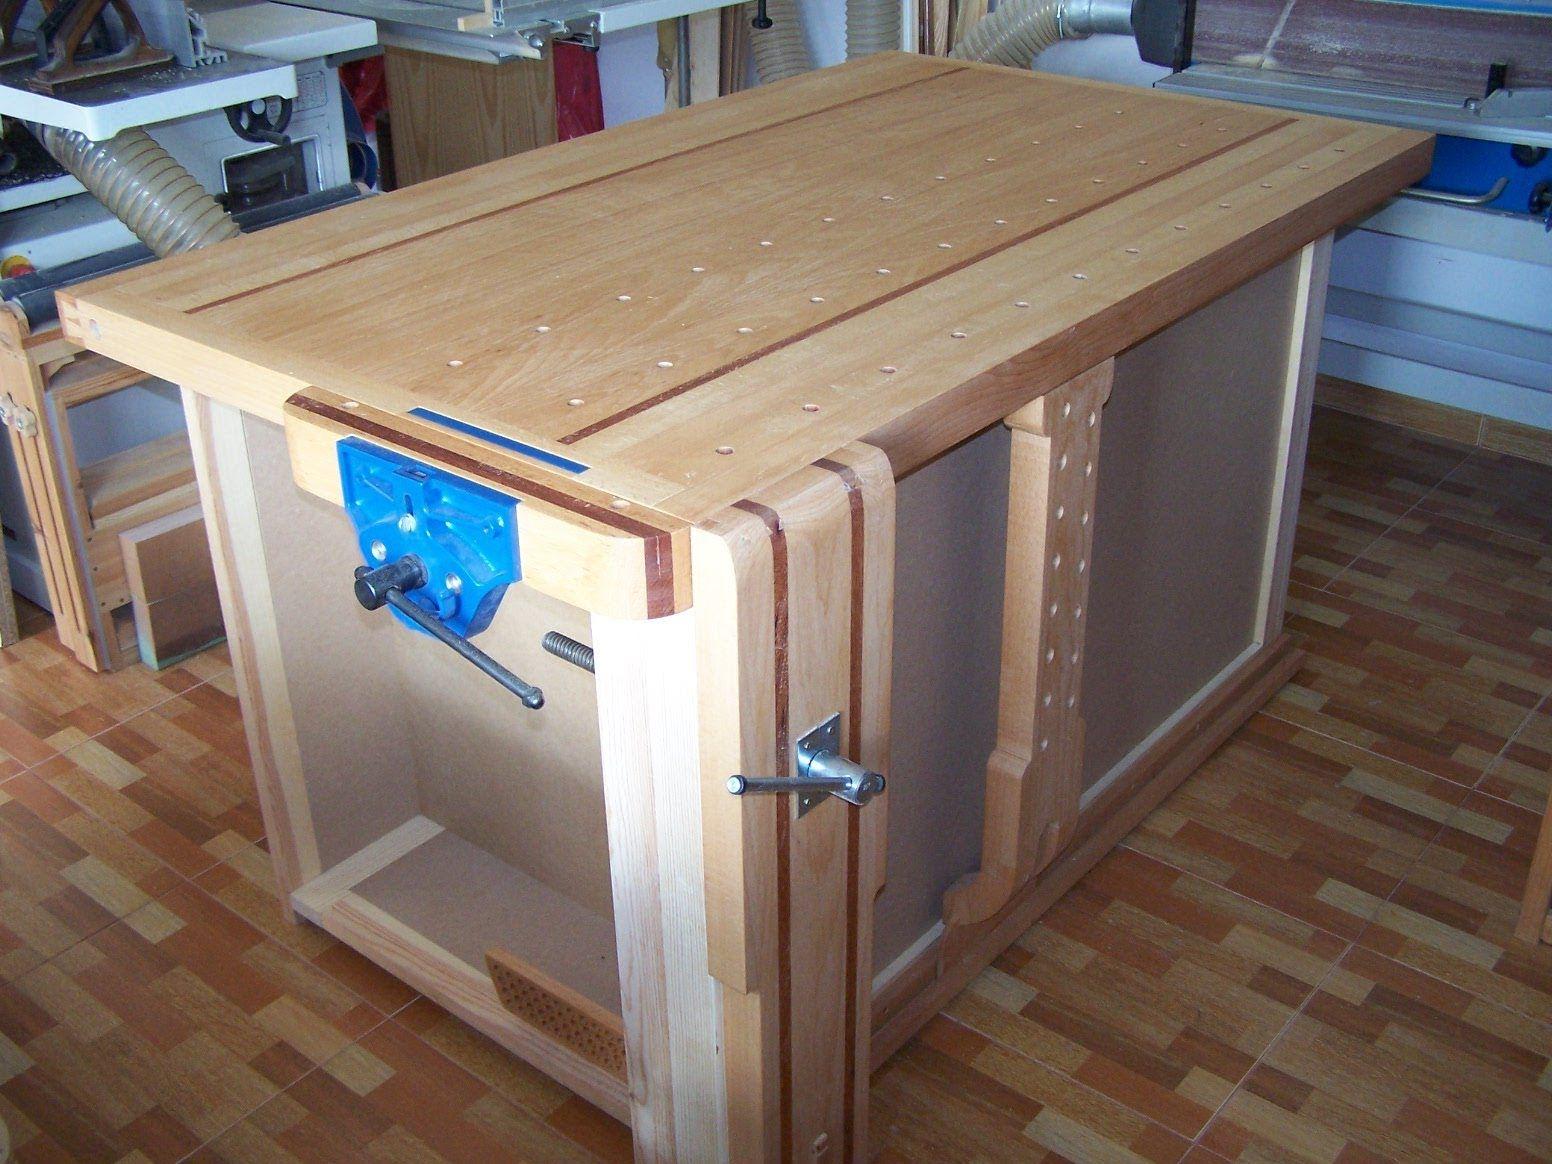 5/5 - Montaje final y acabado - How to build a workbench, final ...